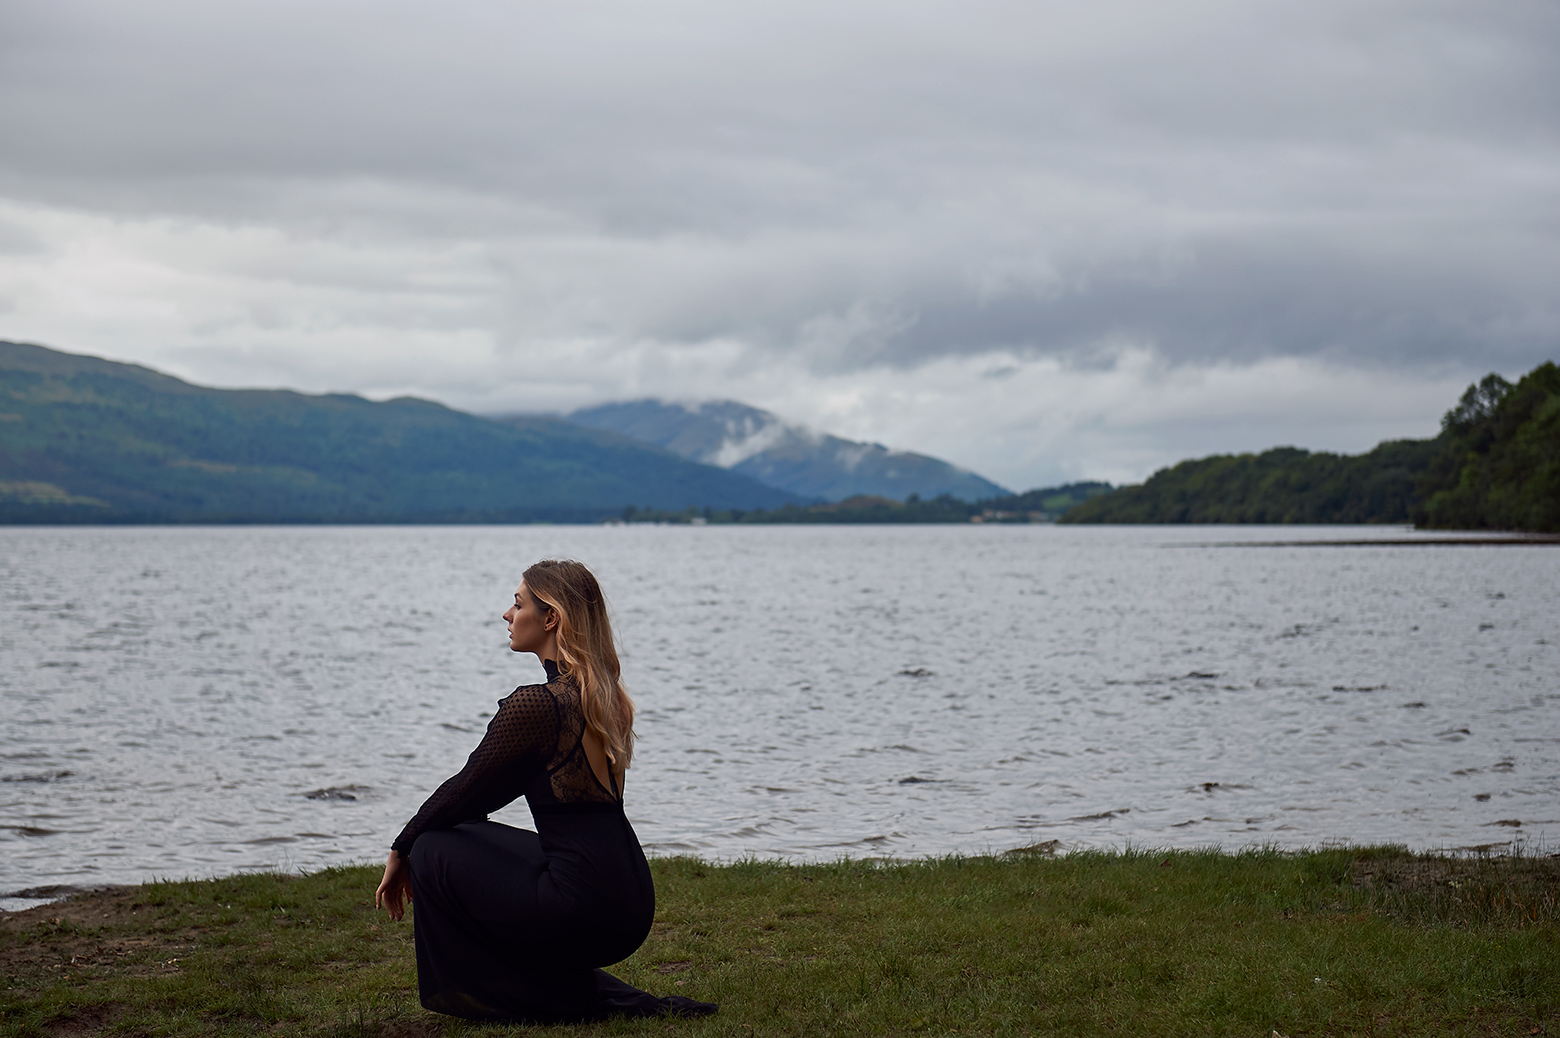 scotland, portrait, photography, ursula schmitz, destination scotland